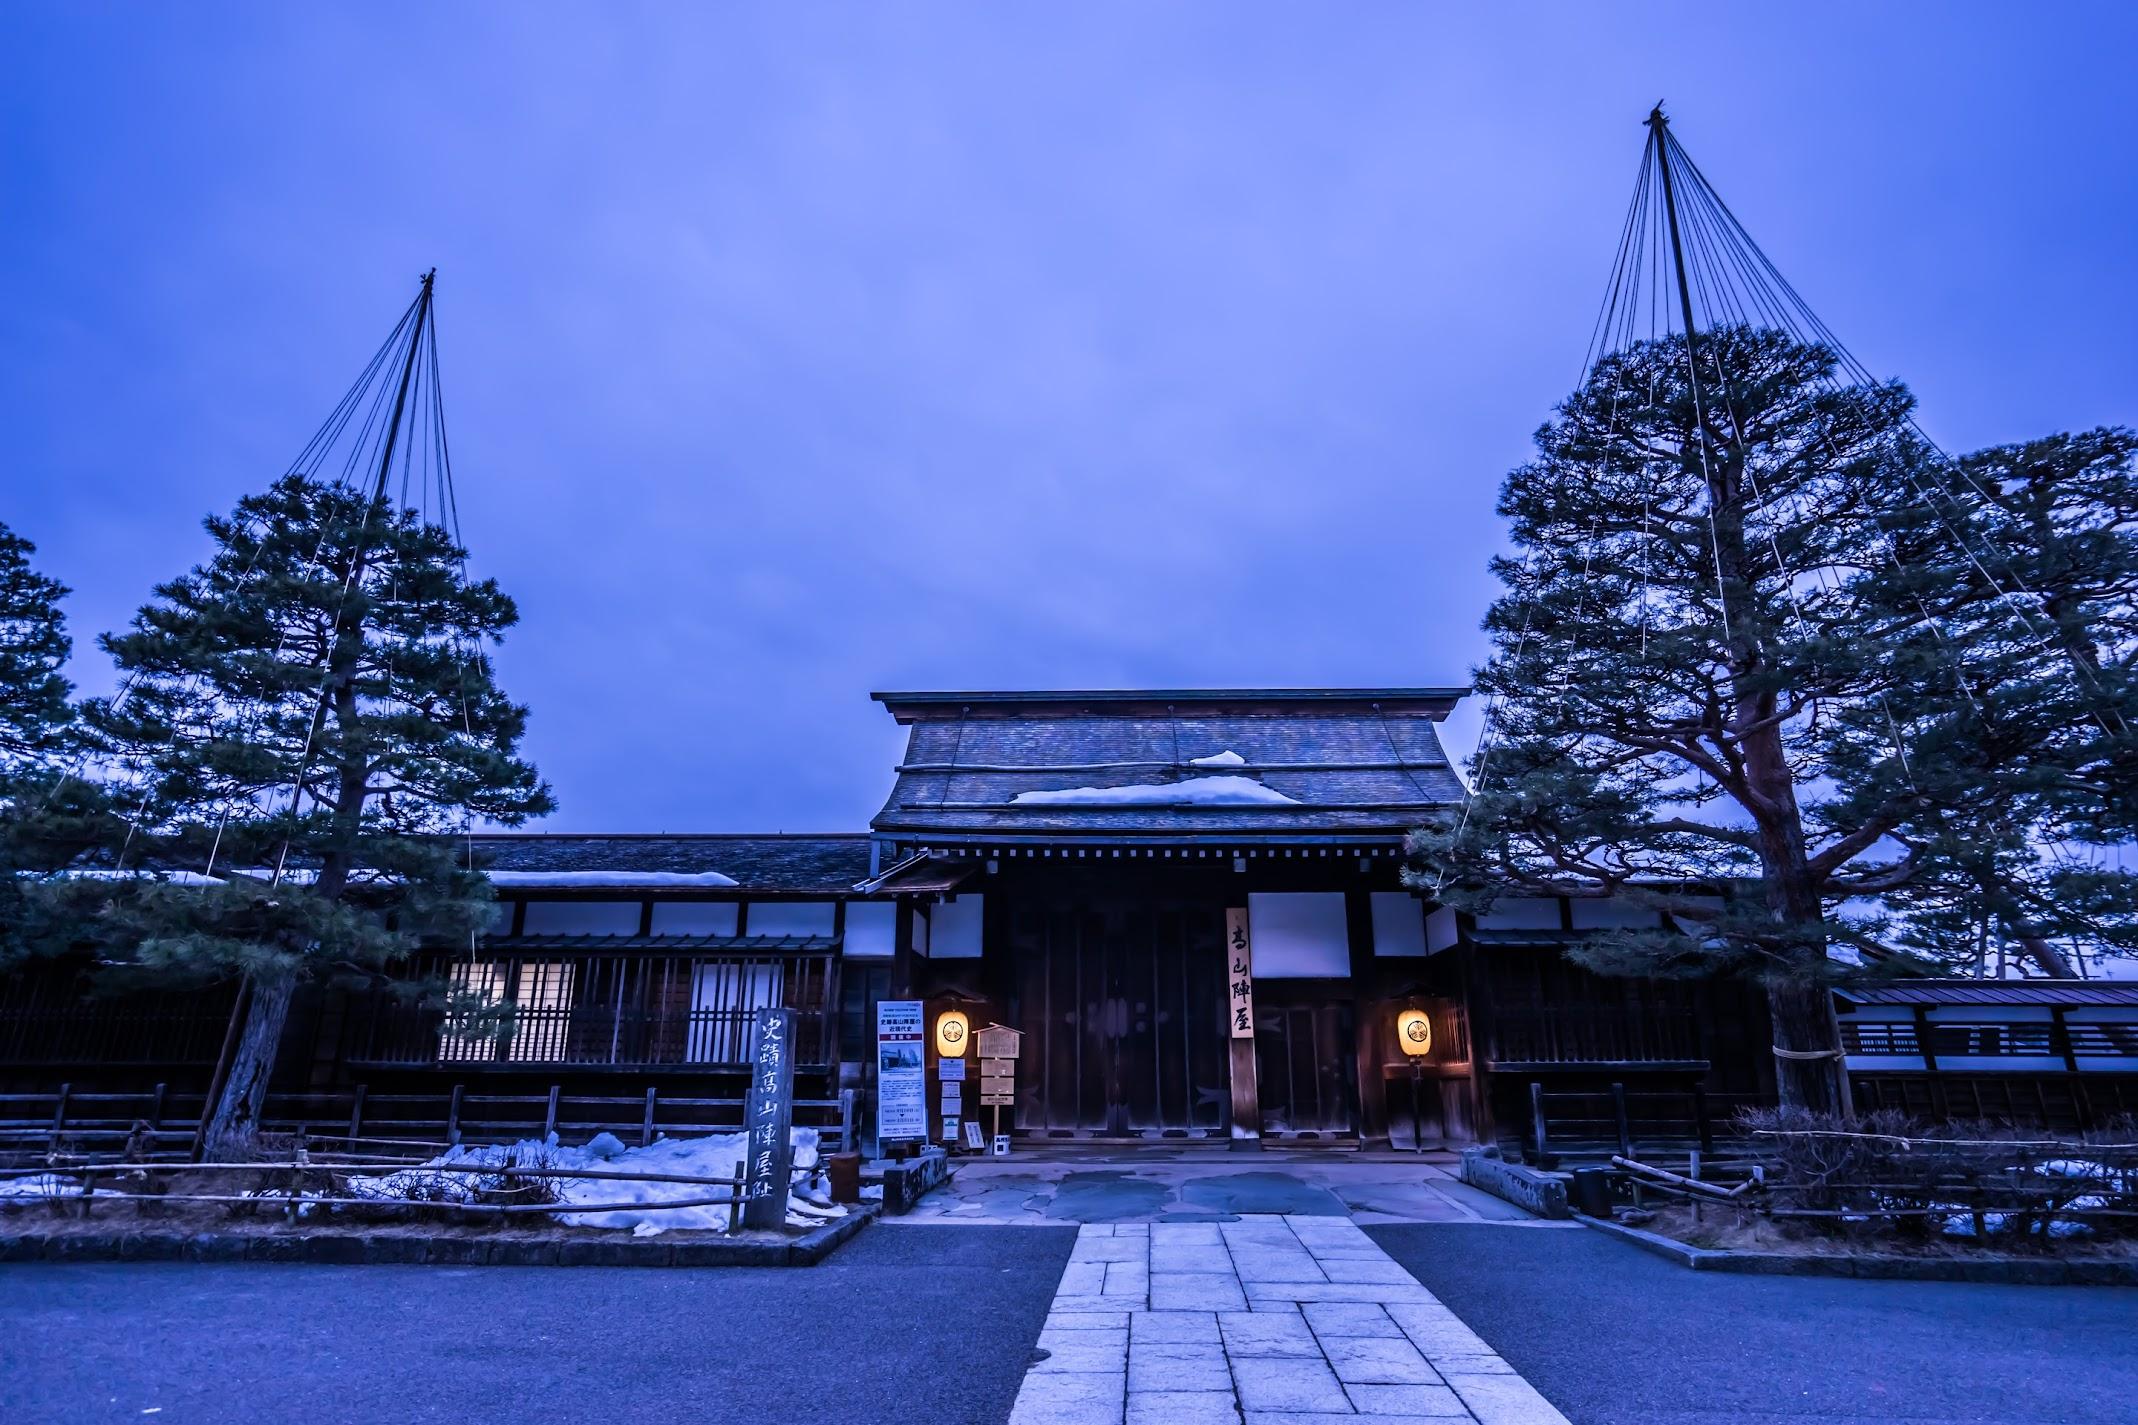 Hida Takayama Jinya evening